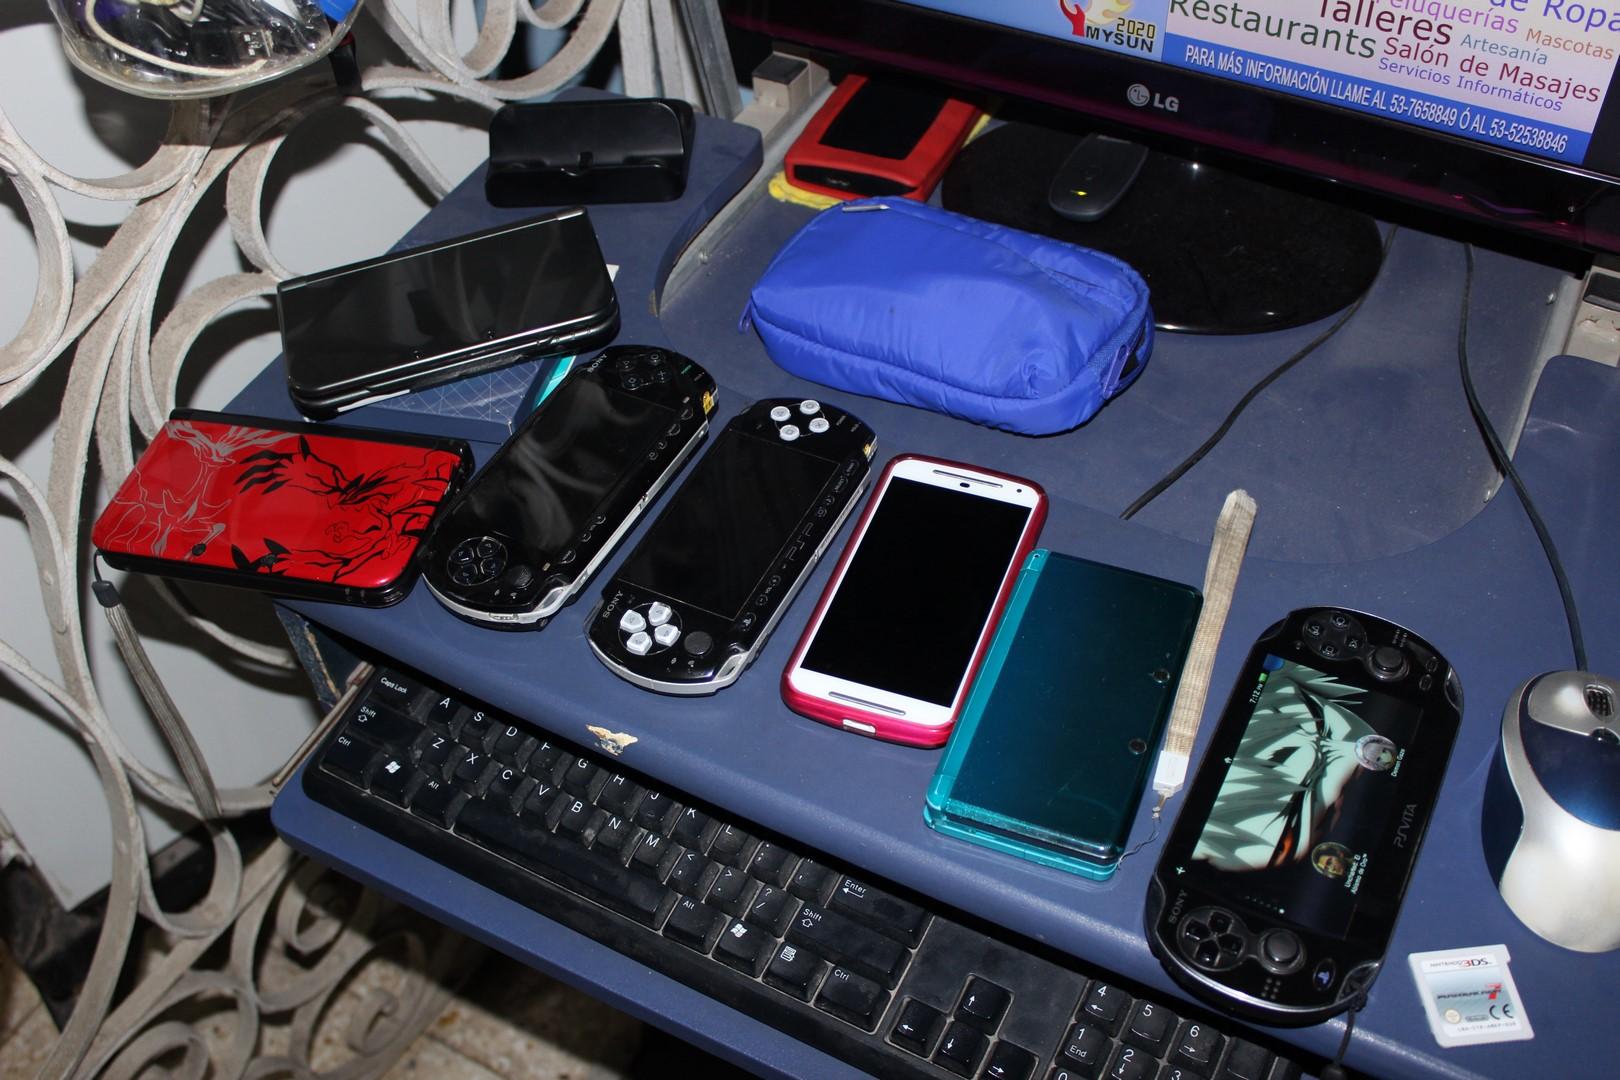 lh_videogames_in_cuba_handhelds